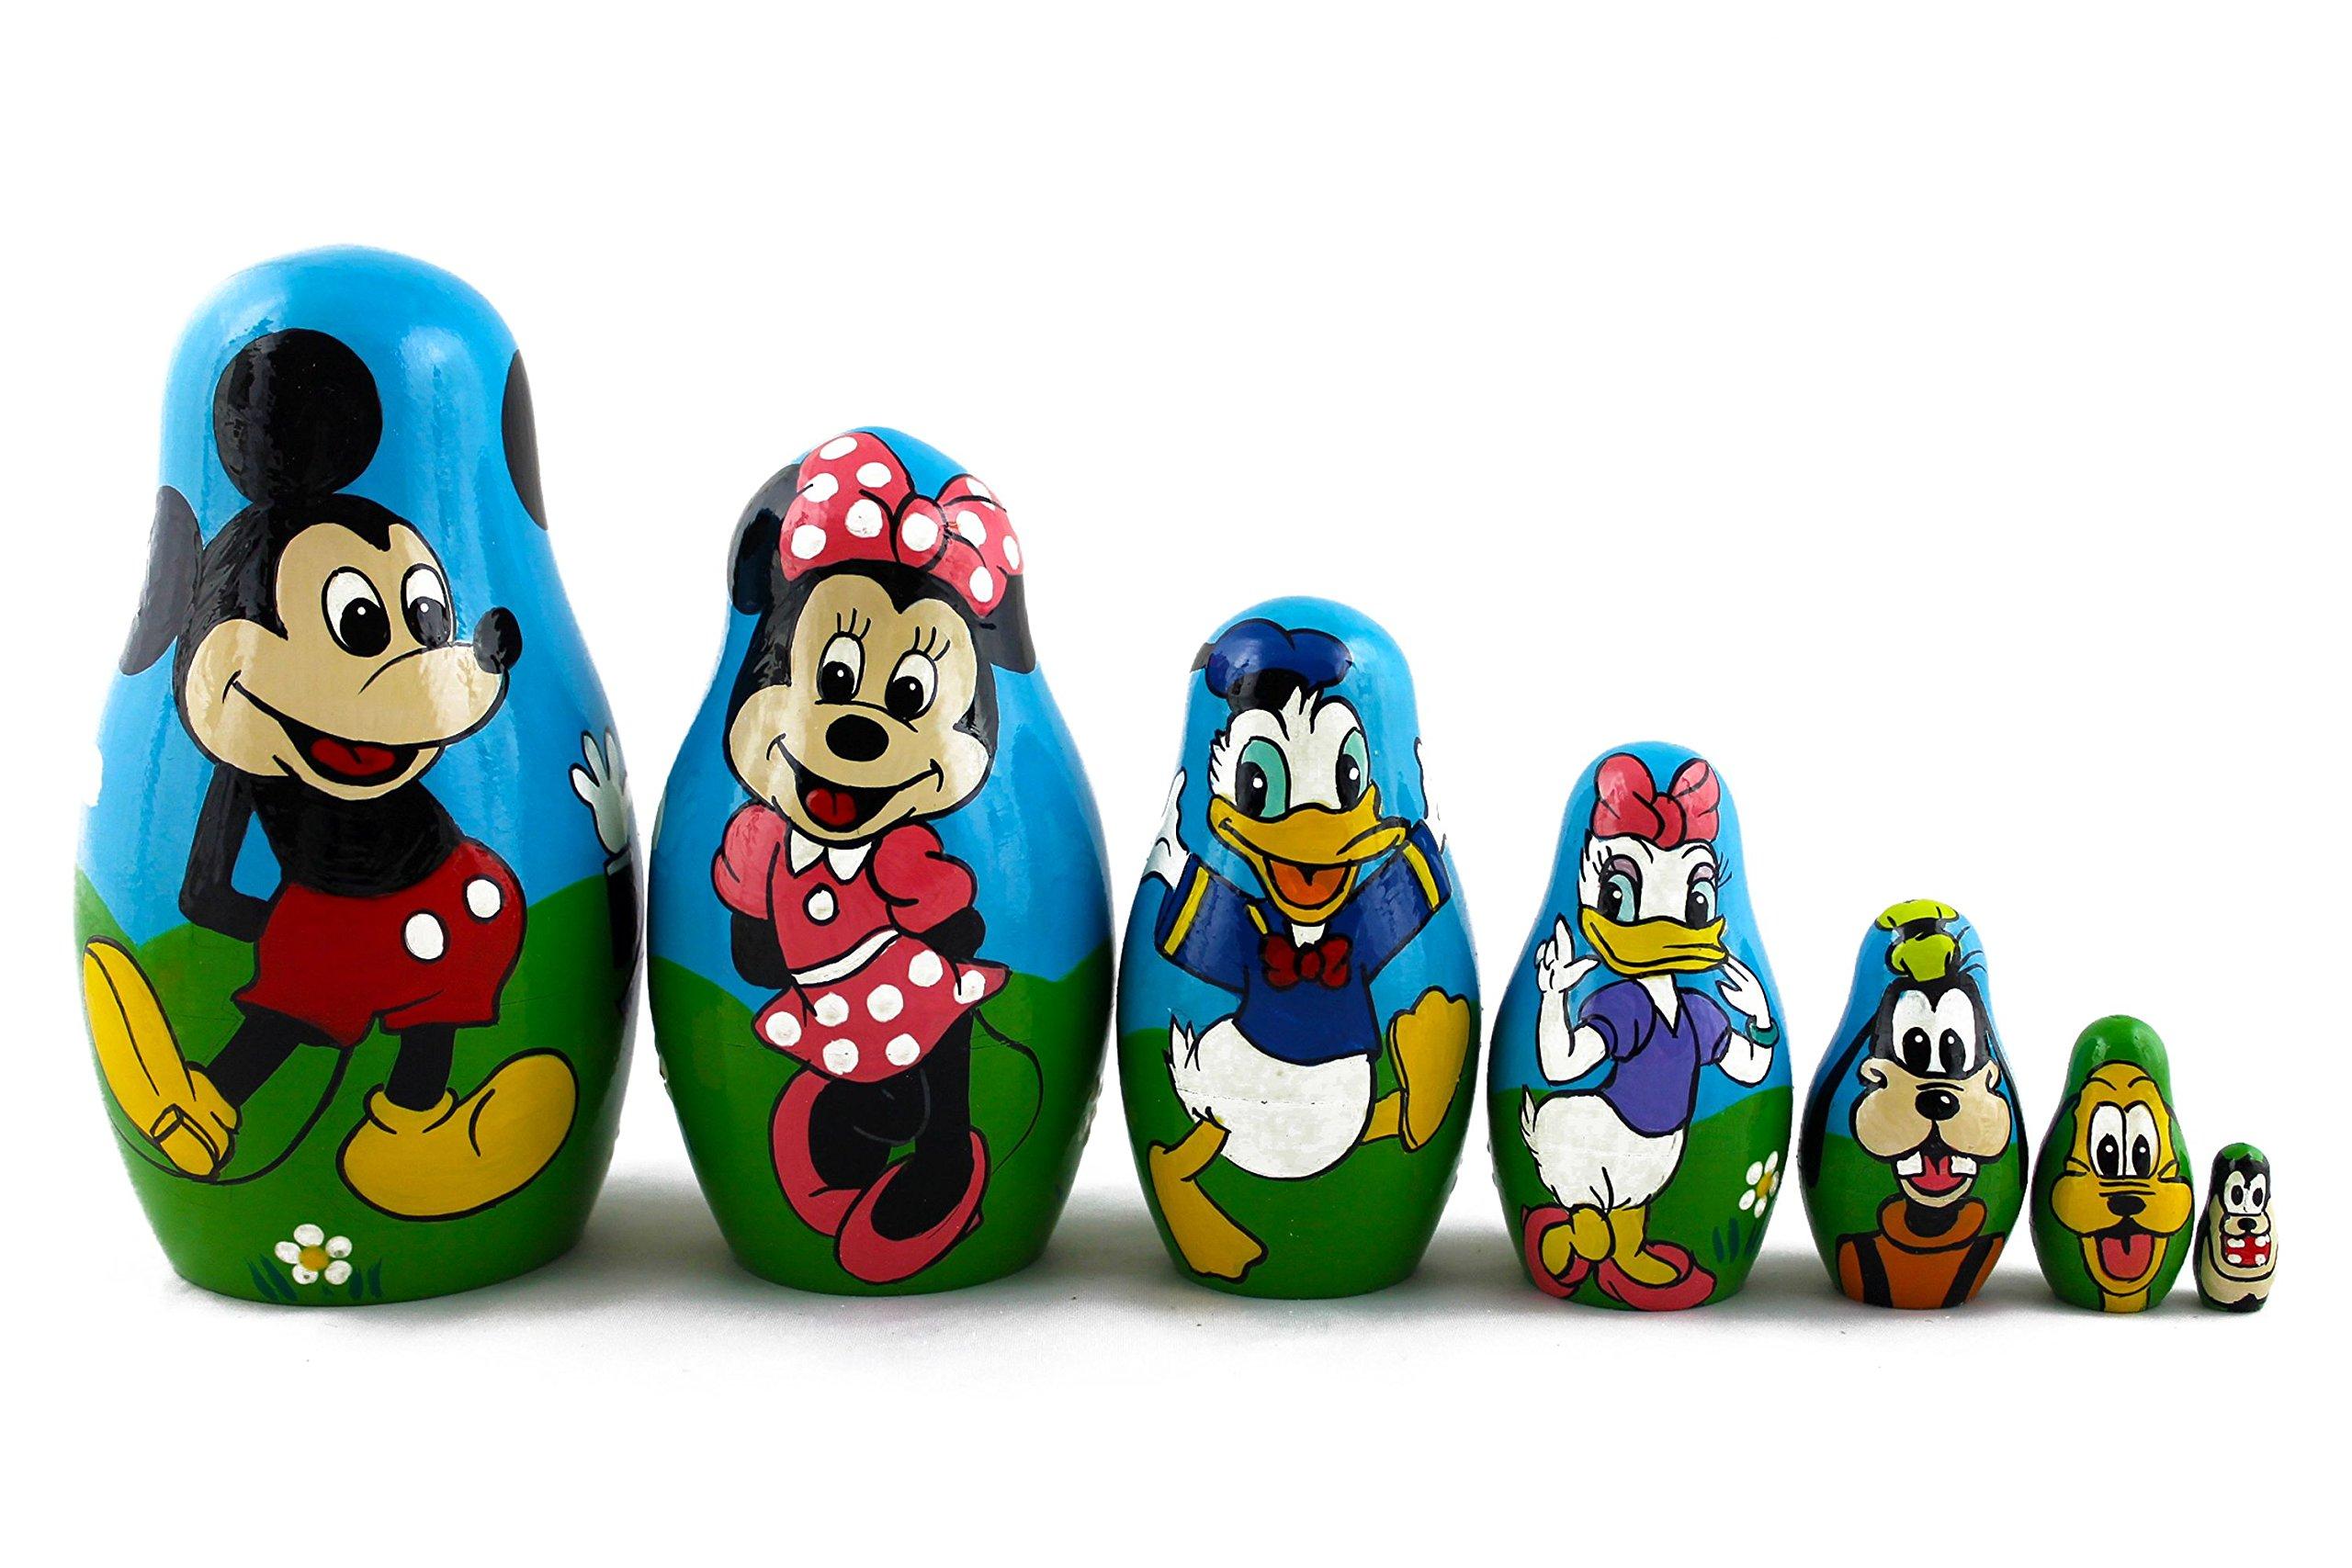 Matryoshka Babushka Russian Nesting Wooden Stacking Doll Characters Mickey Mouse Donald Duck 7 Pcs